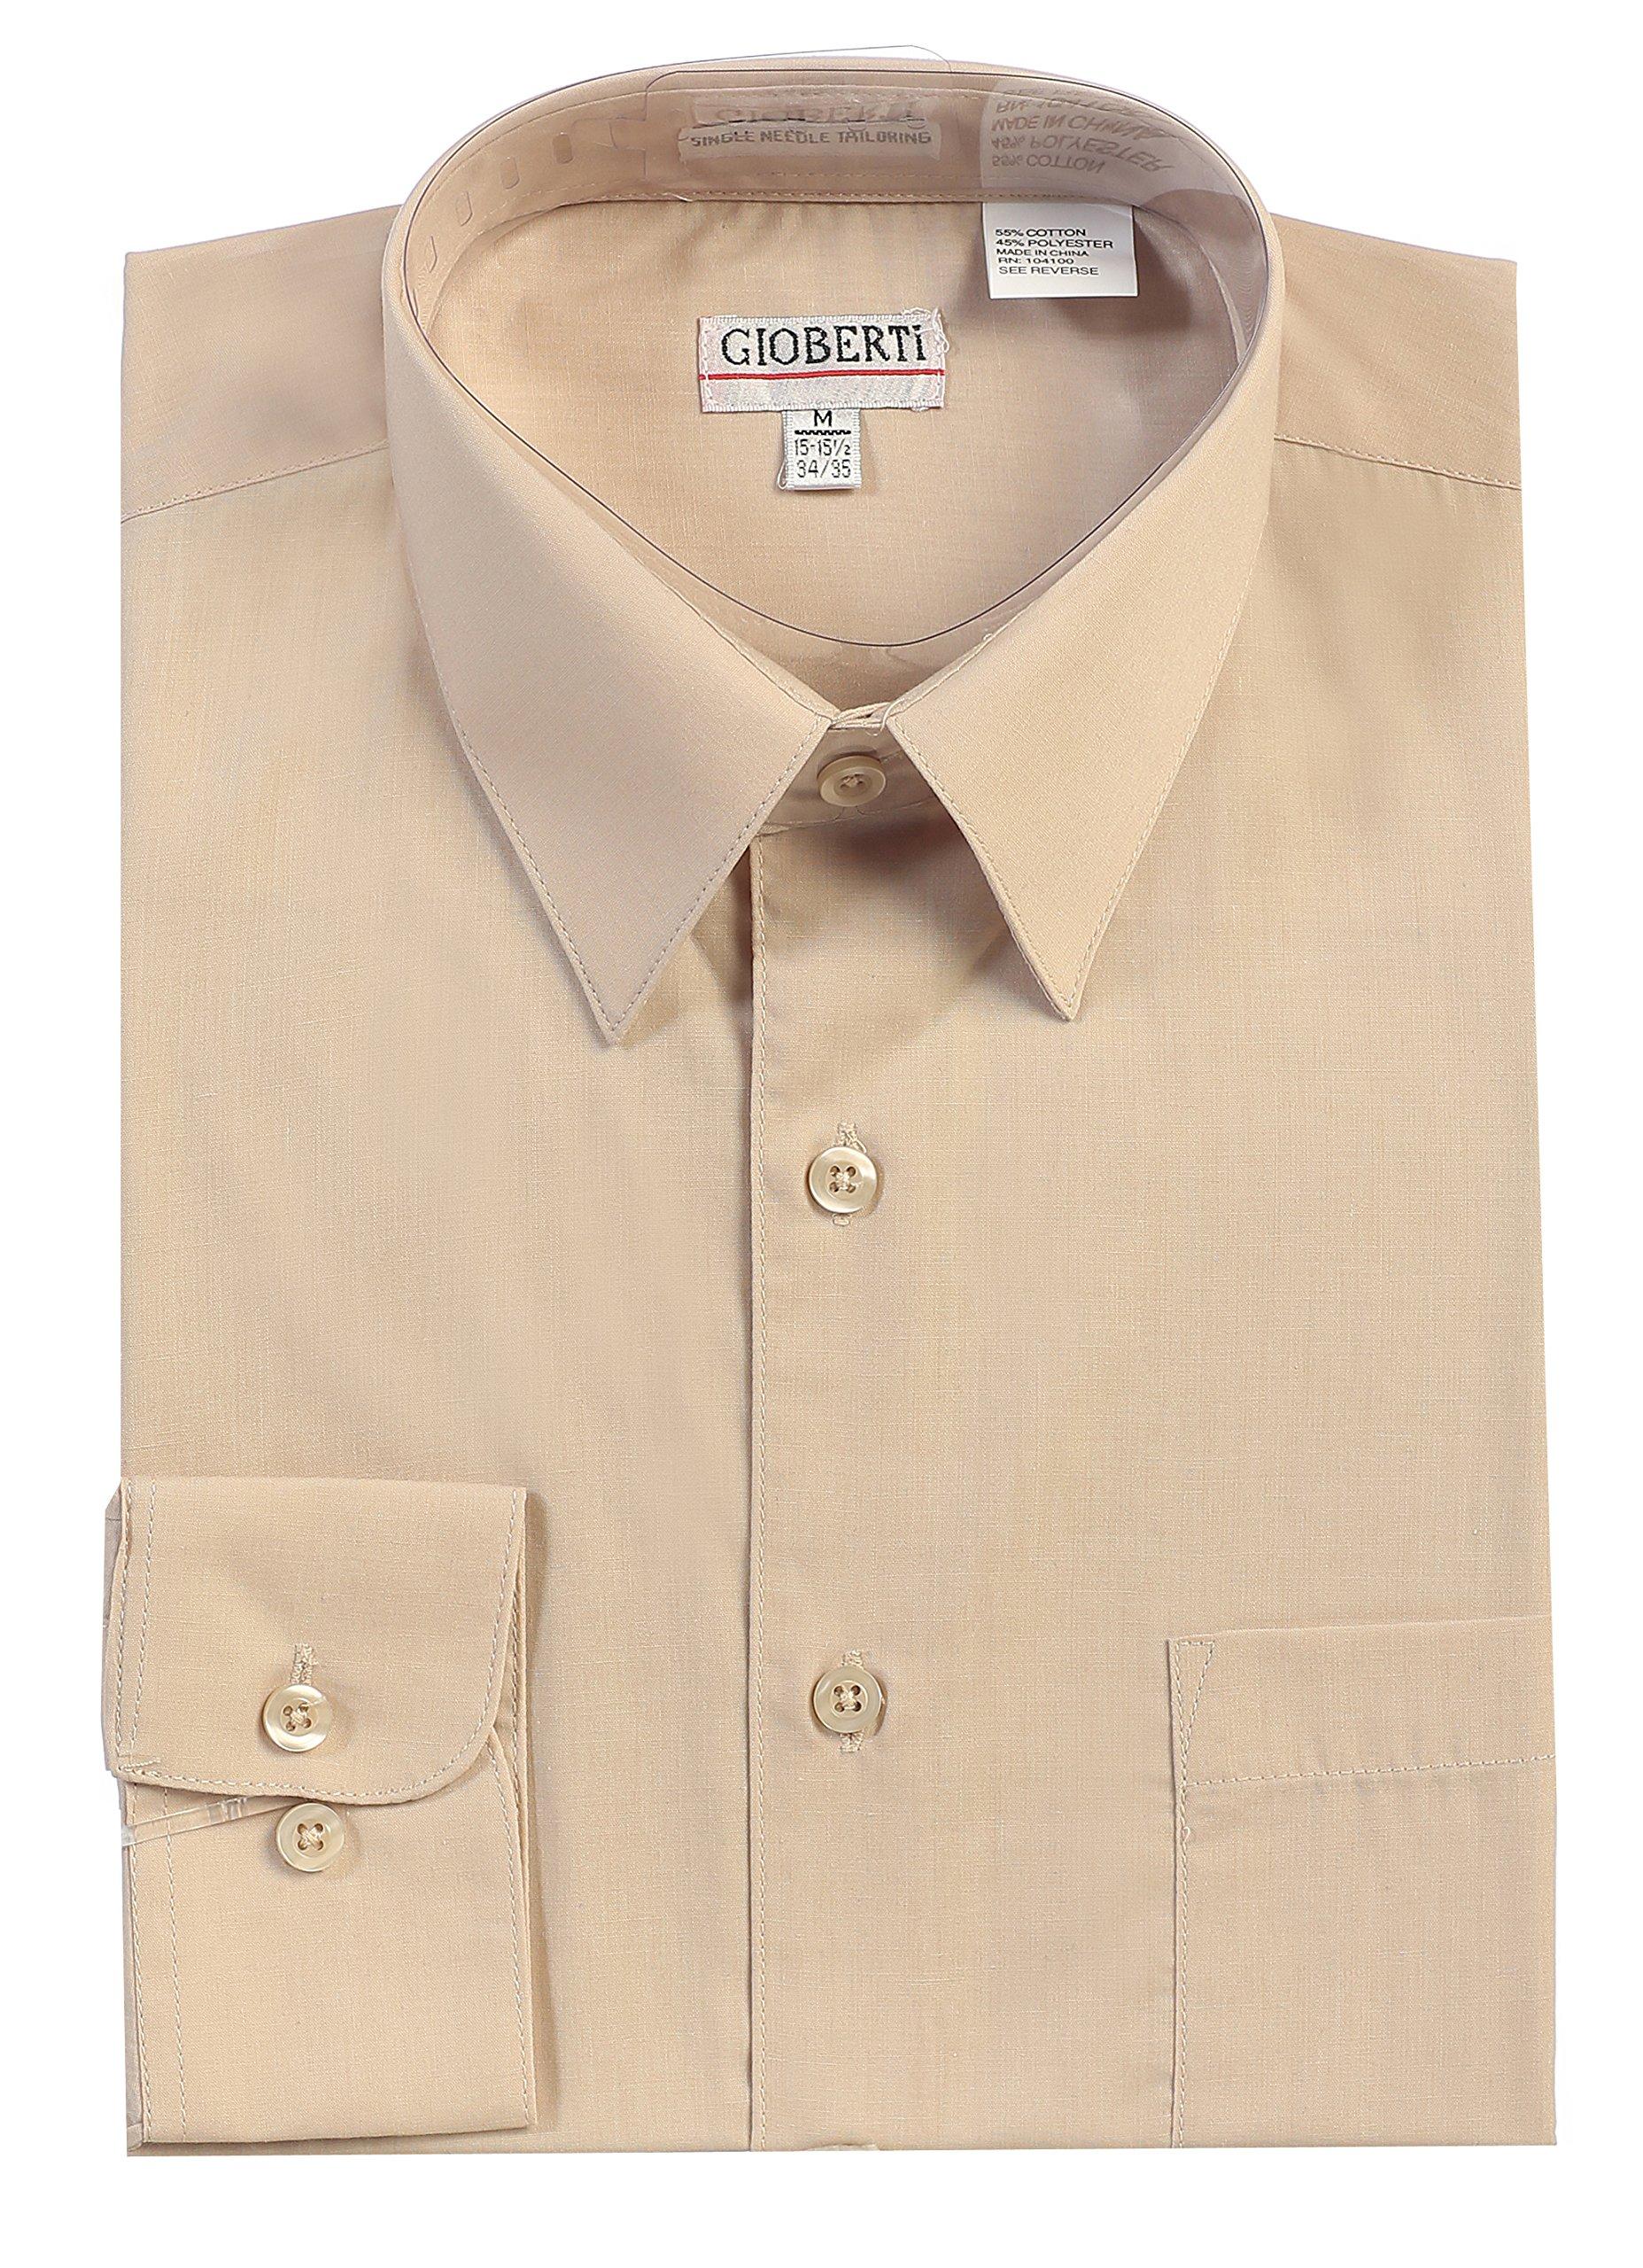 Gioberti Men's Long Sleeve Solid Dress Shirt, Khaki B, 2X Large, Sleeve 37-38